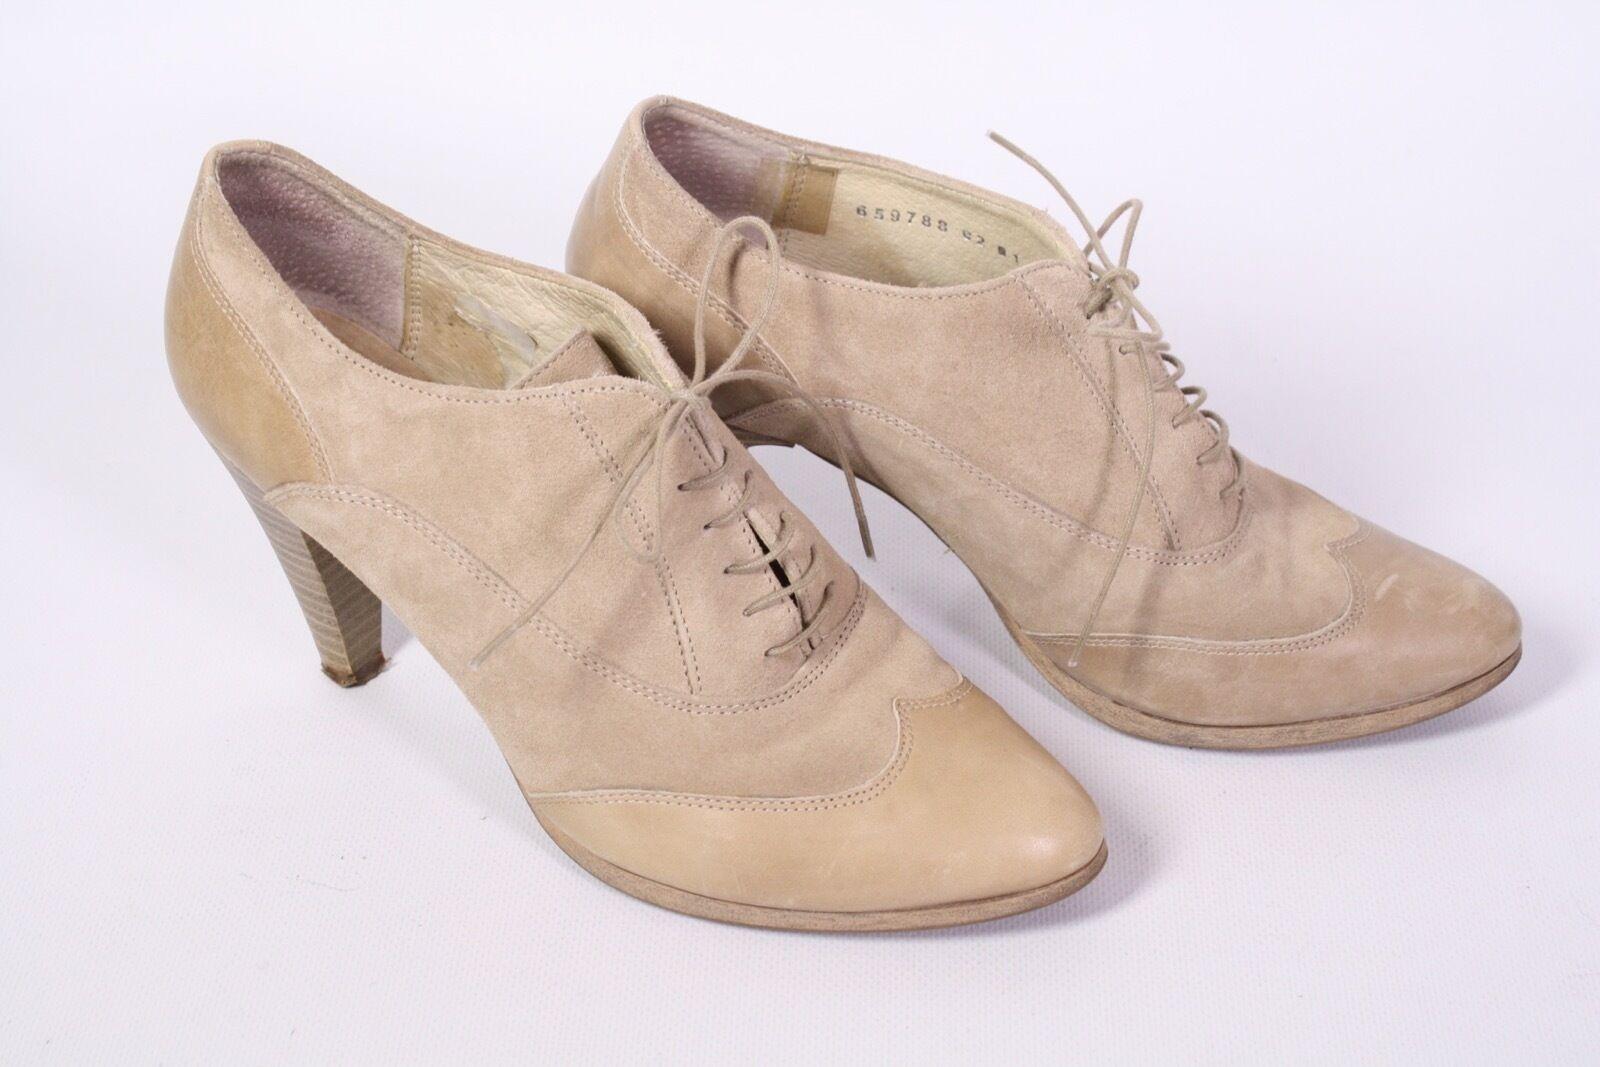 22D Görtz 17 Damen Ankle Boots Schnürpumps Velours Leder beige kitt Gr. 39